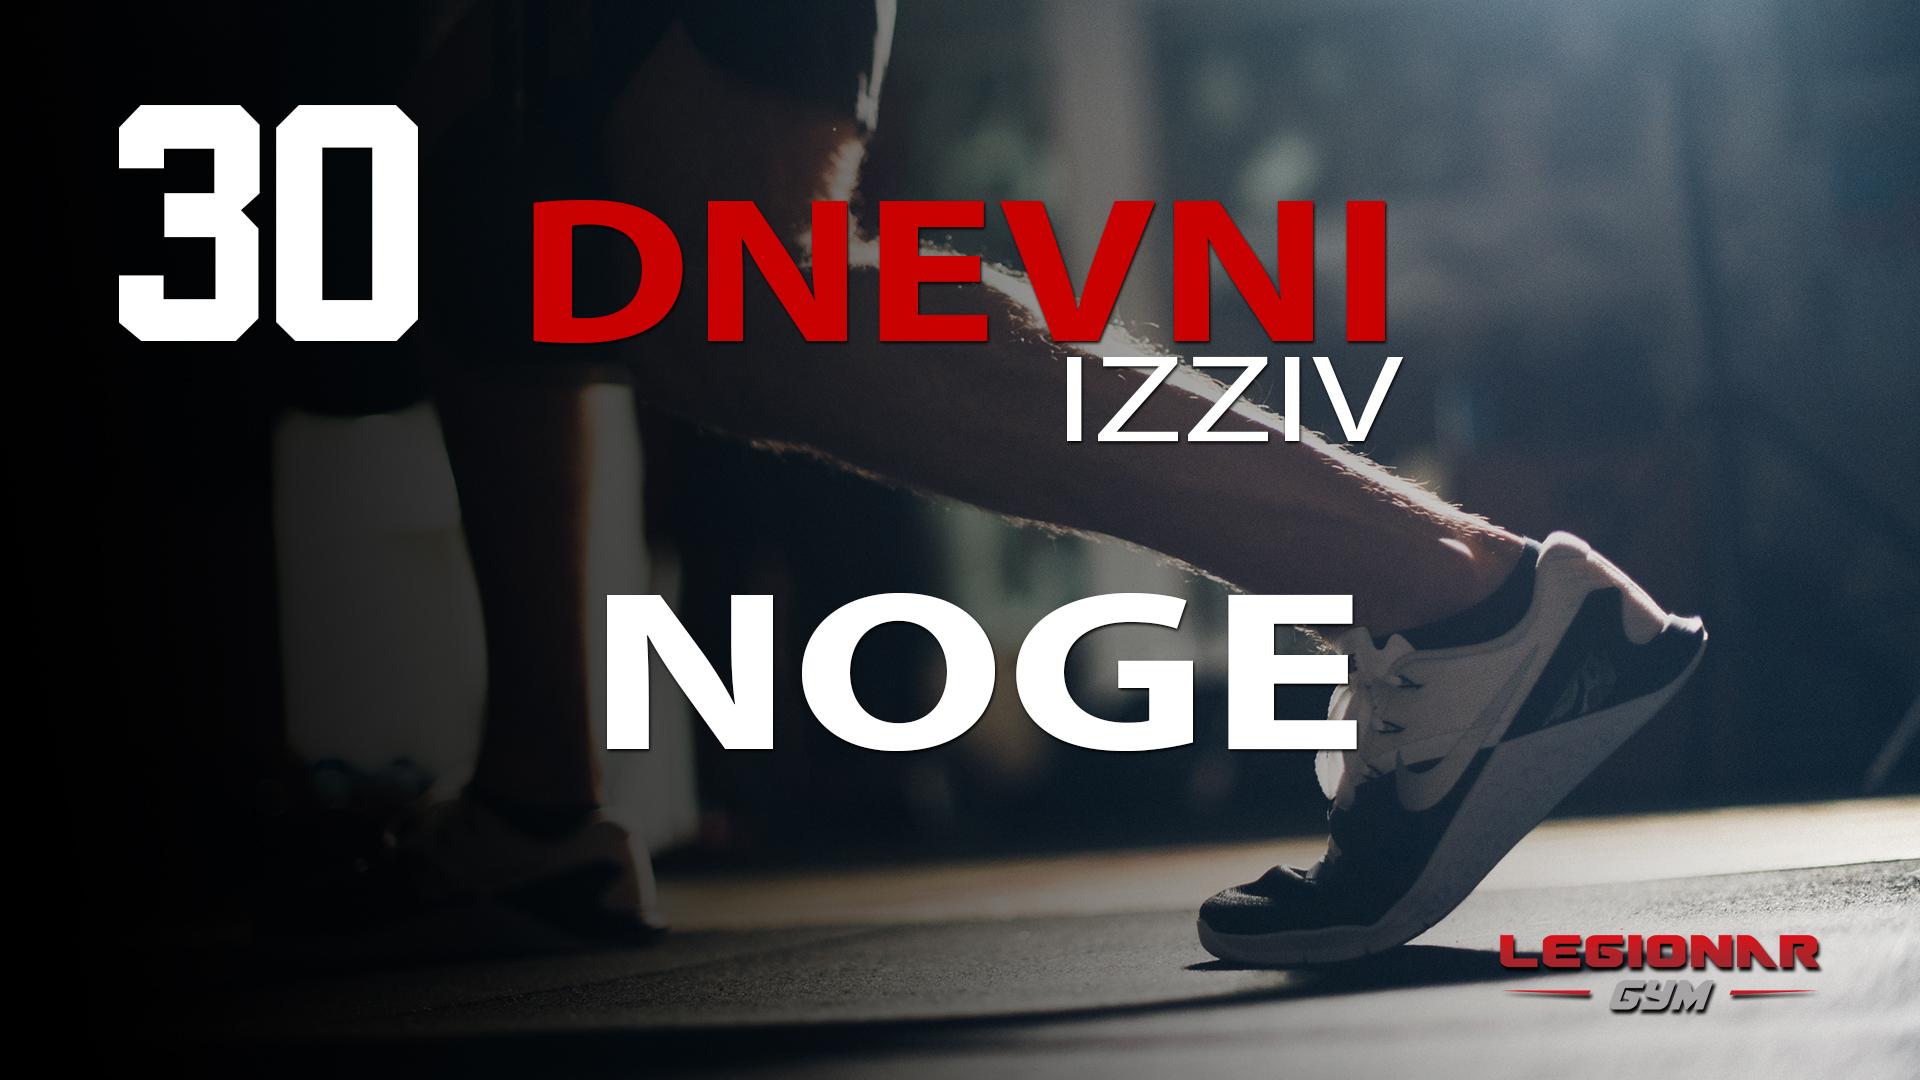 30 dnevni izziv za NOGE